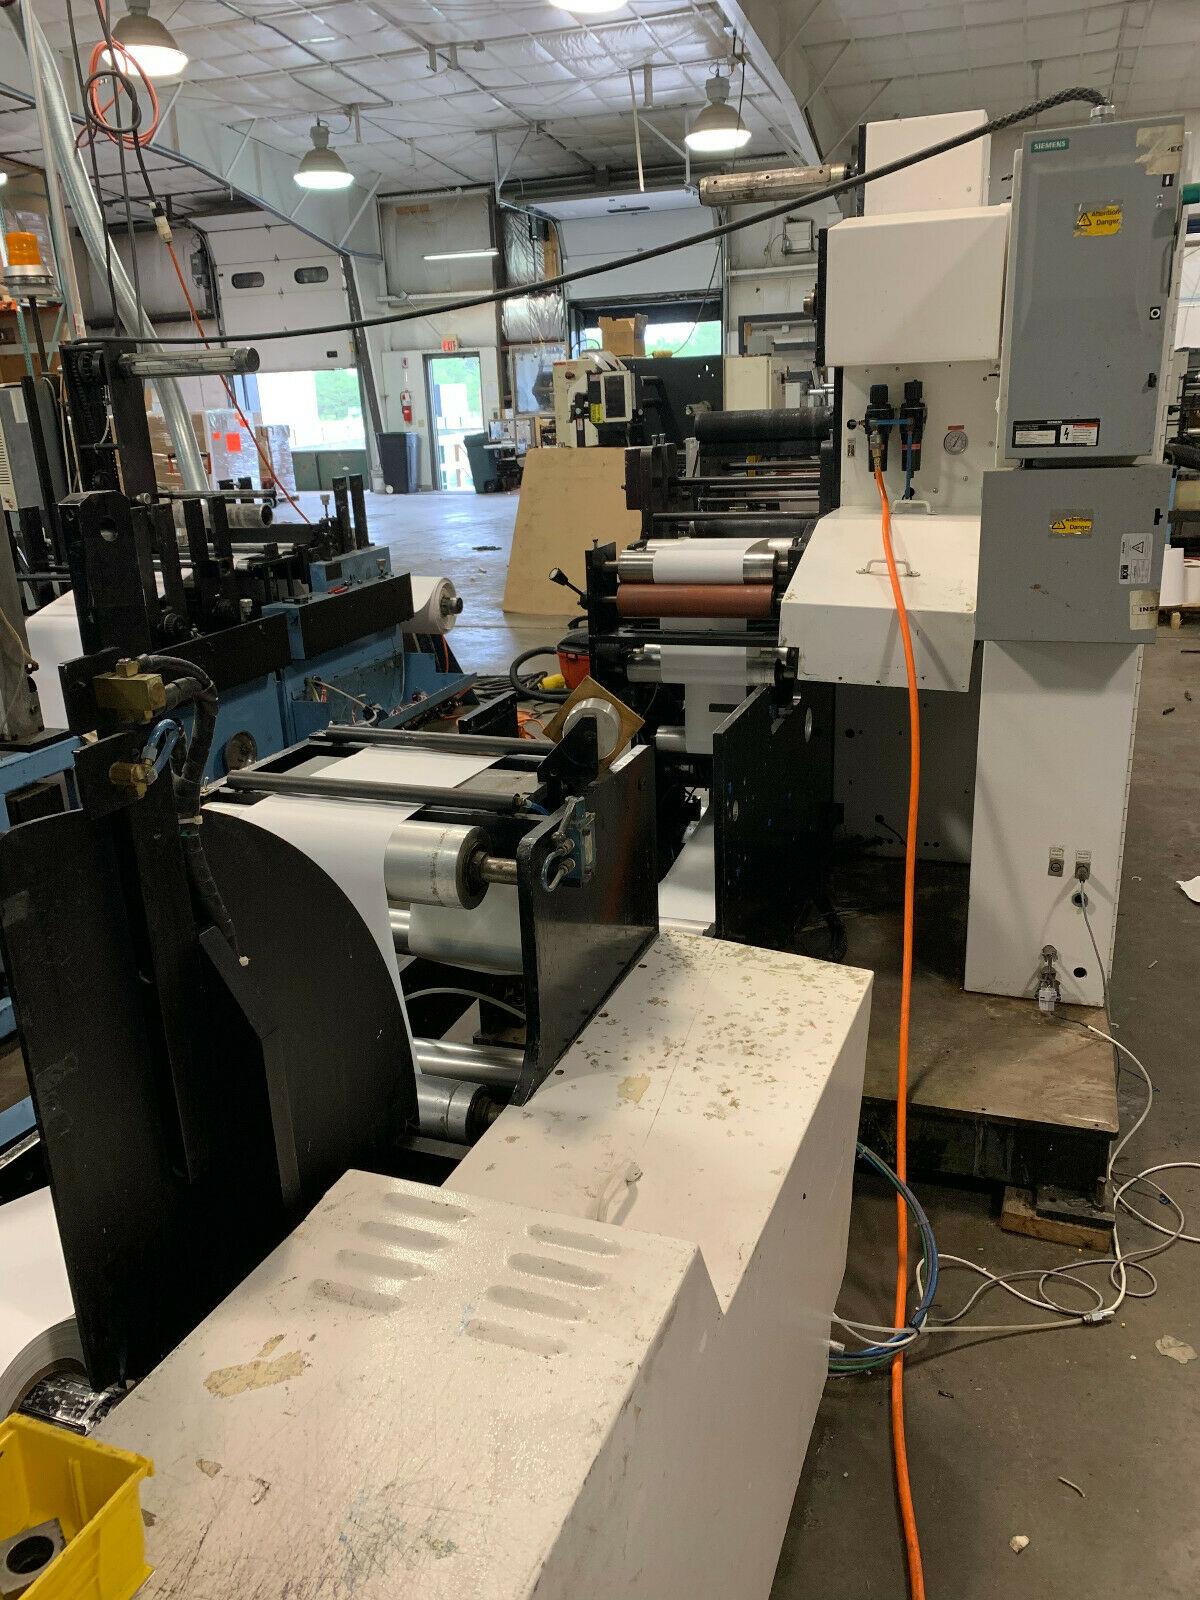 Rotoflex DLI330 - Used Flexo Printing Presses and Used Flexographic Equipment-6